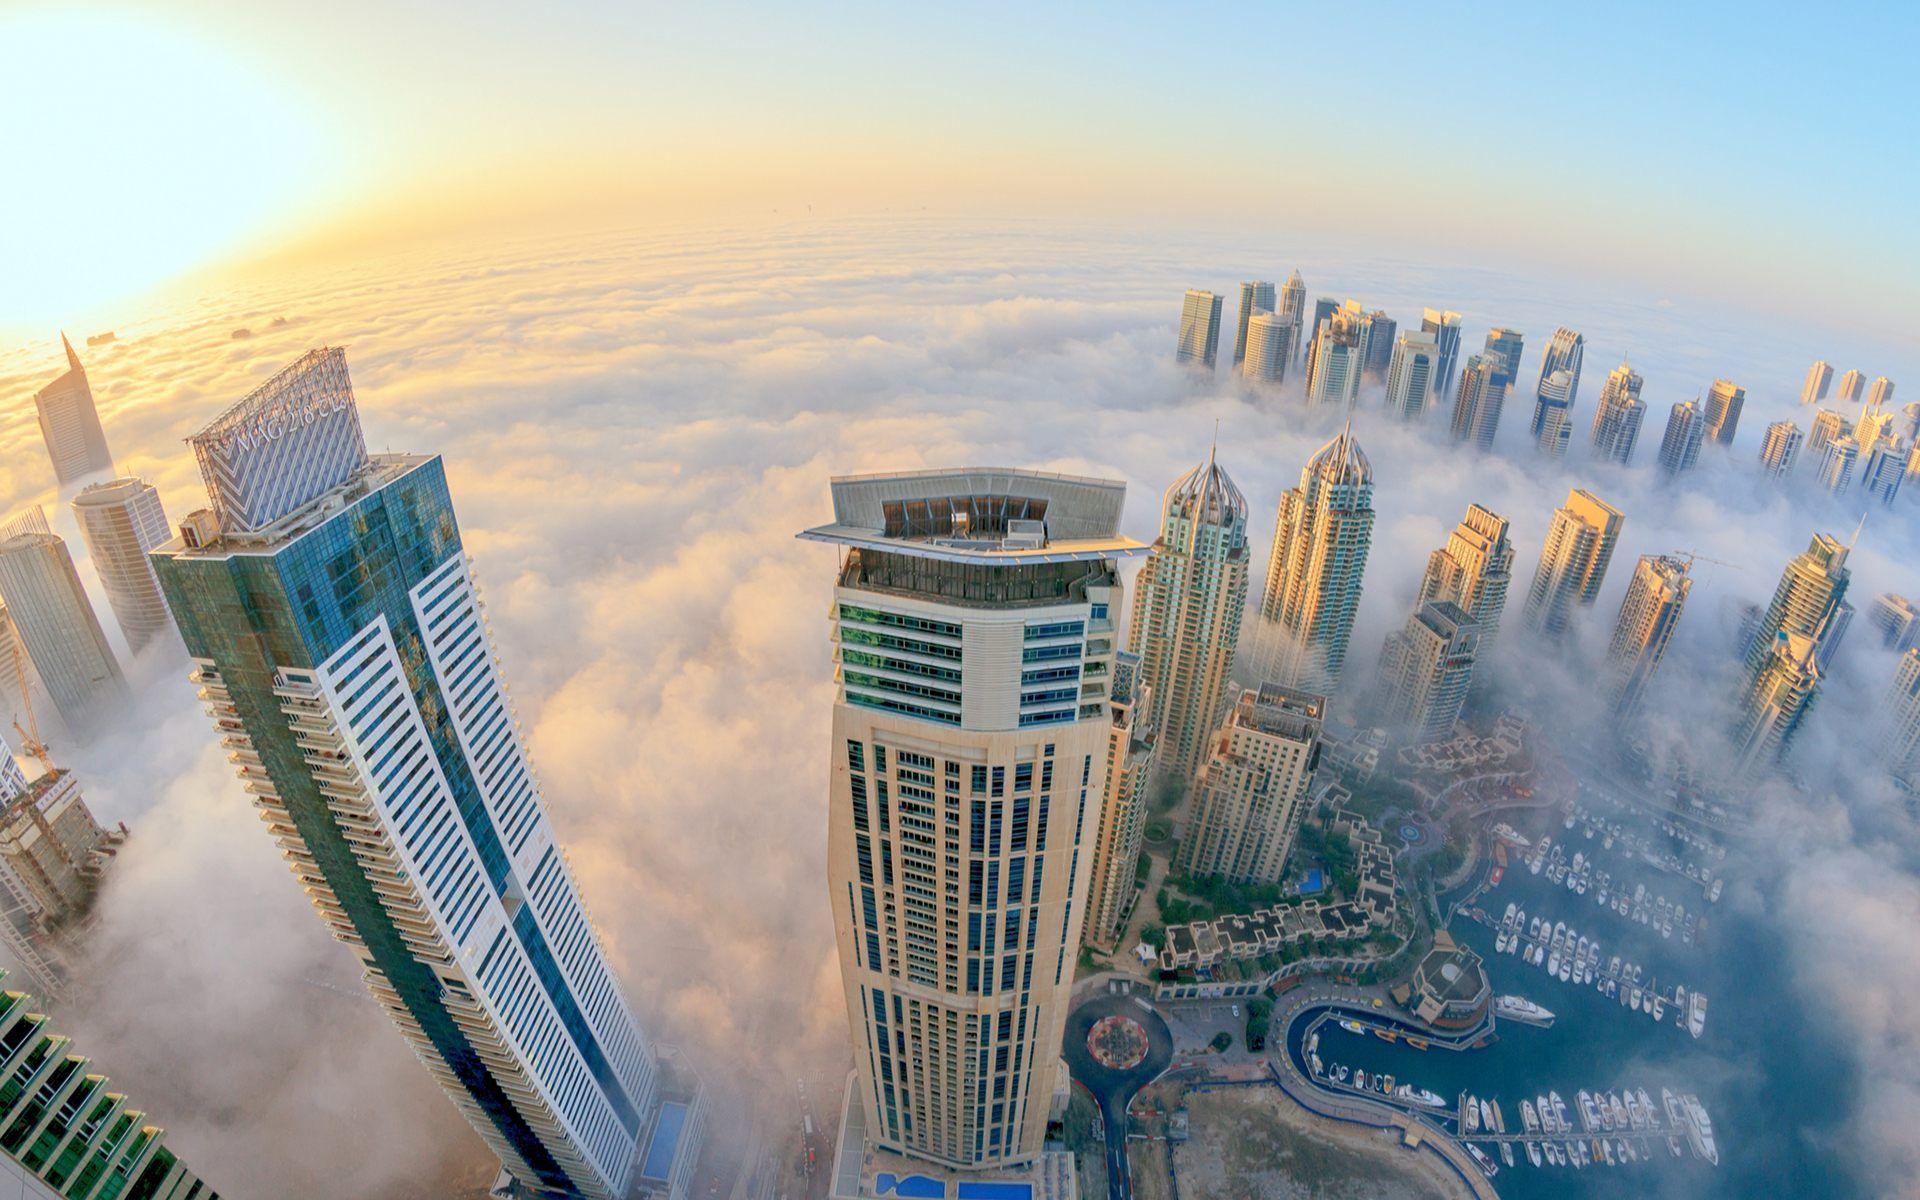 Dubai Marina Night City Wallpaper Hd For Desktop Mobile Dubai